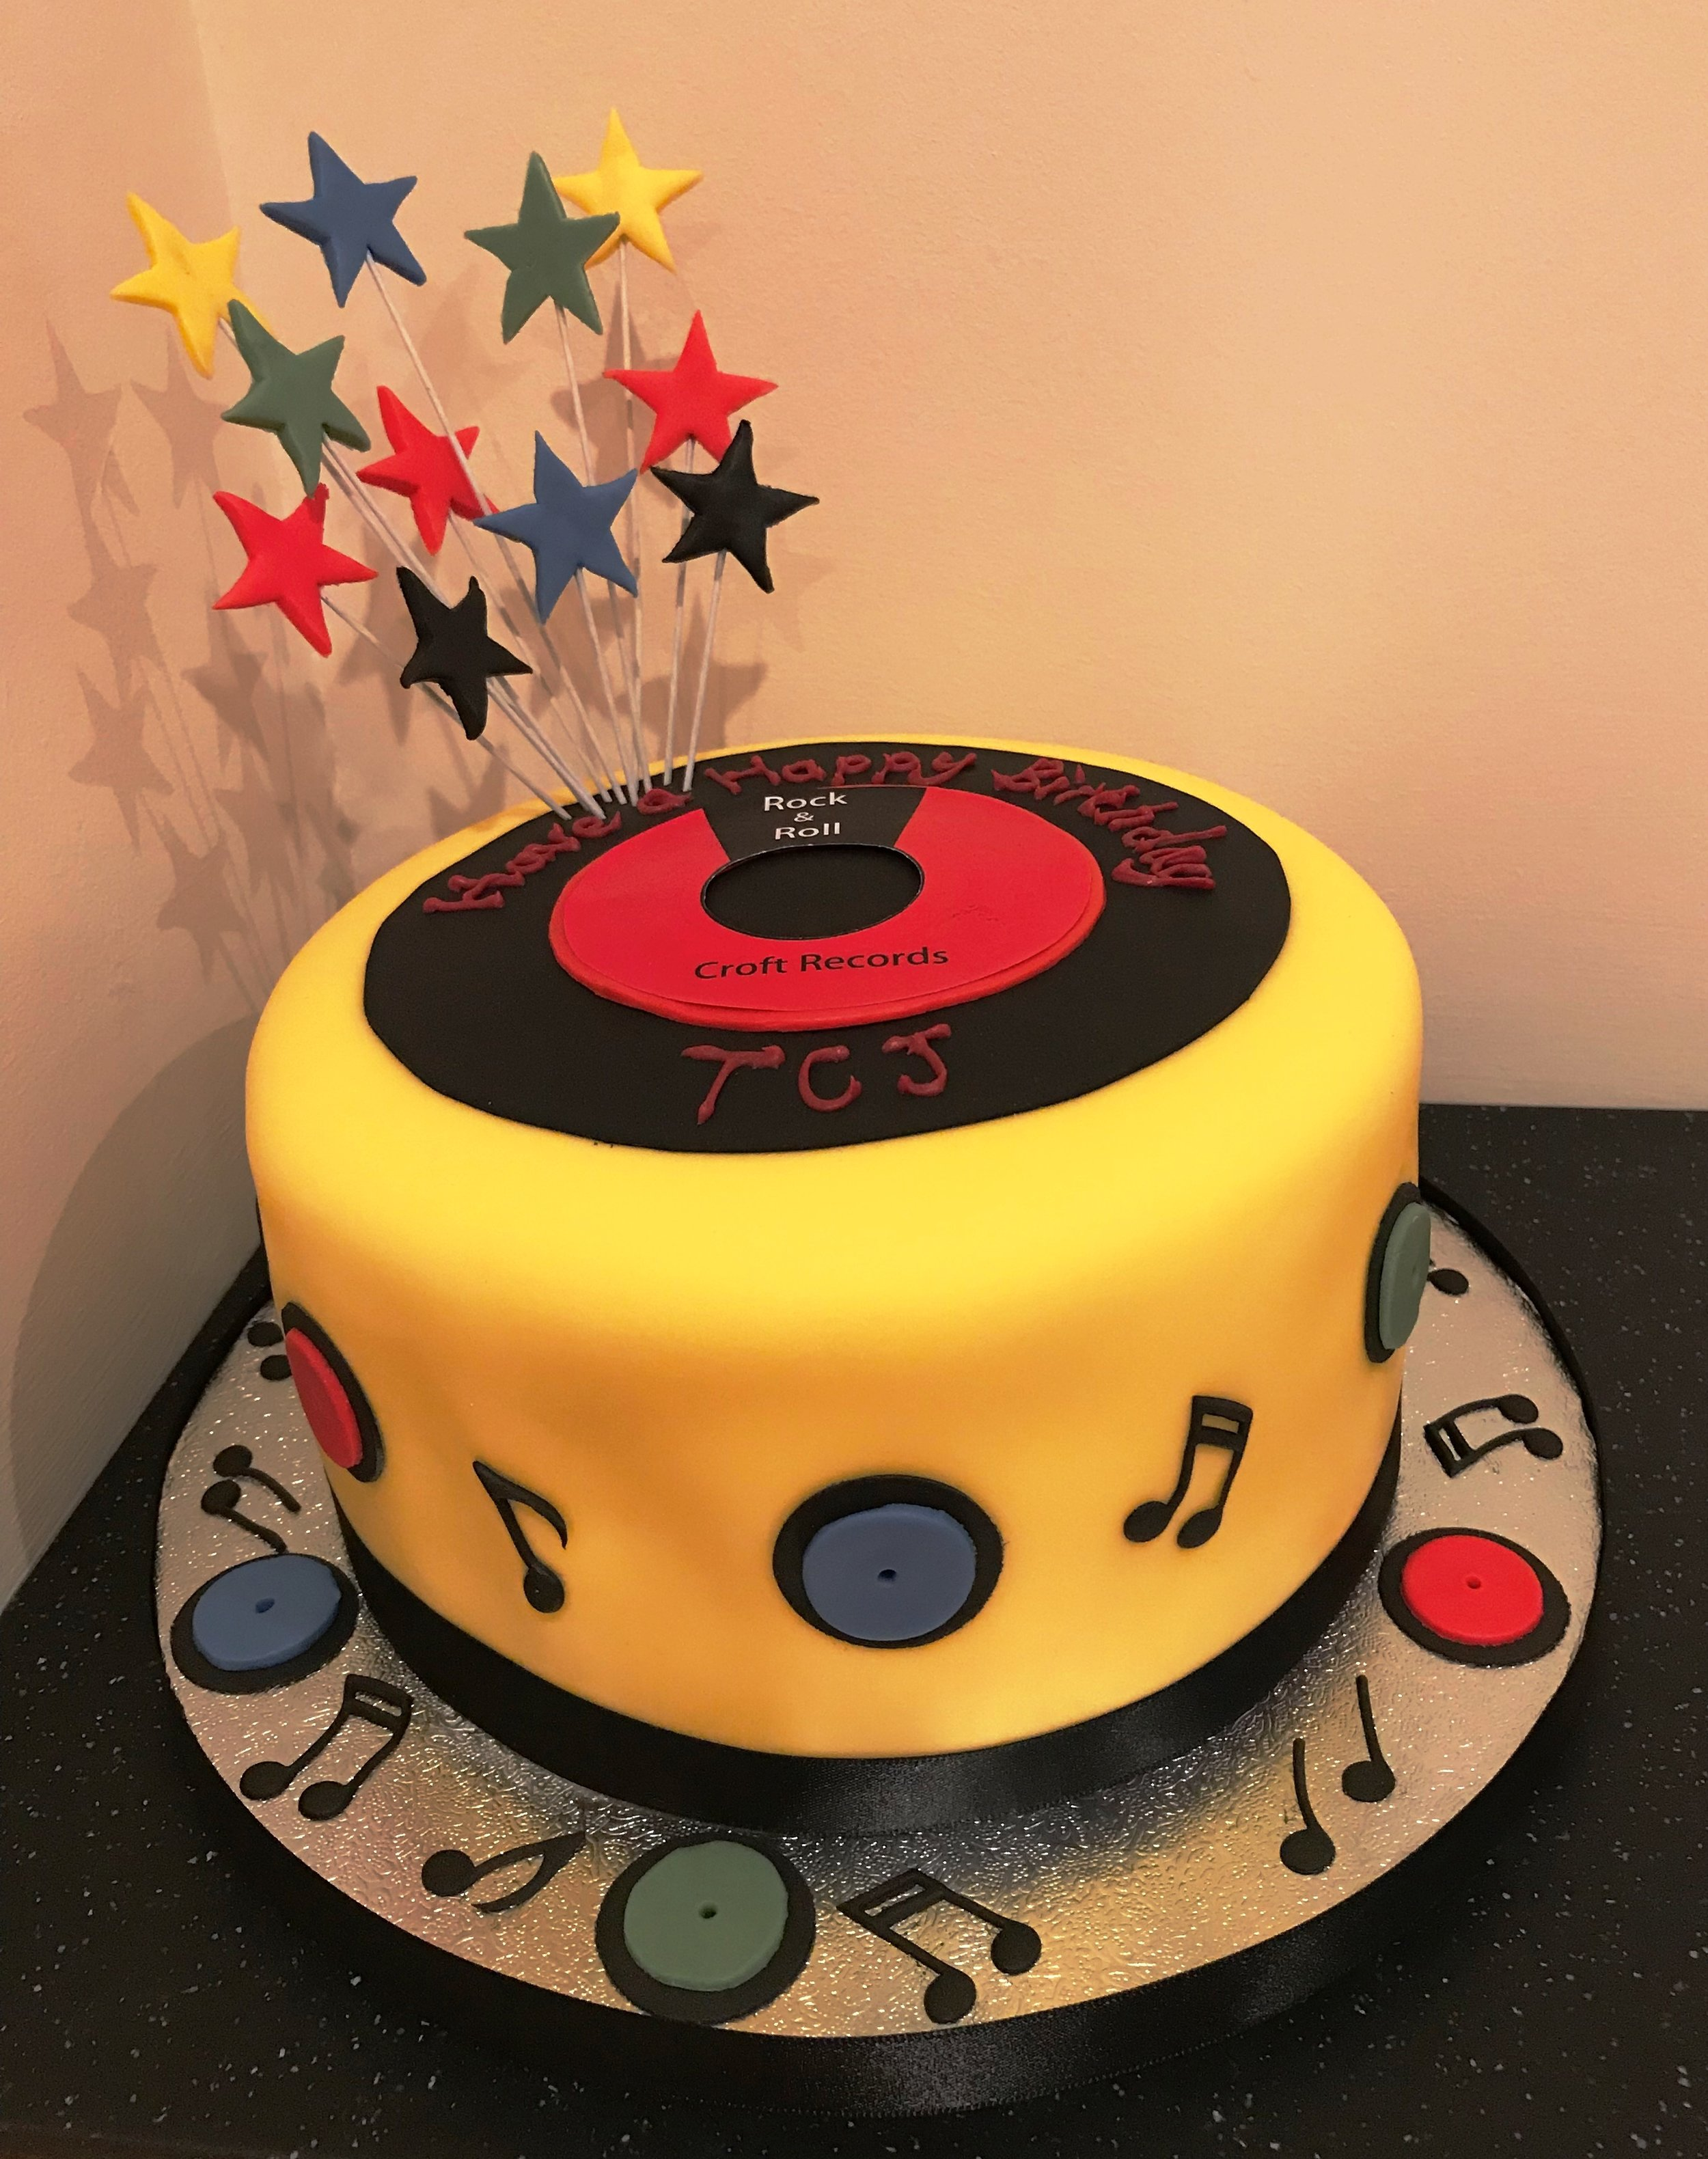 TCJ's music record cake!